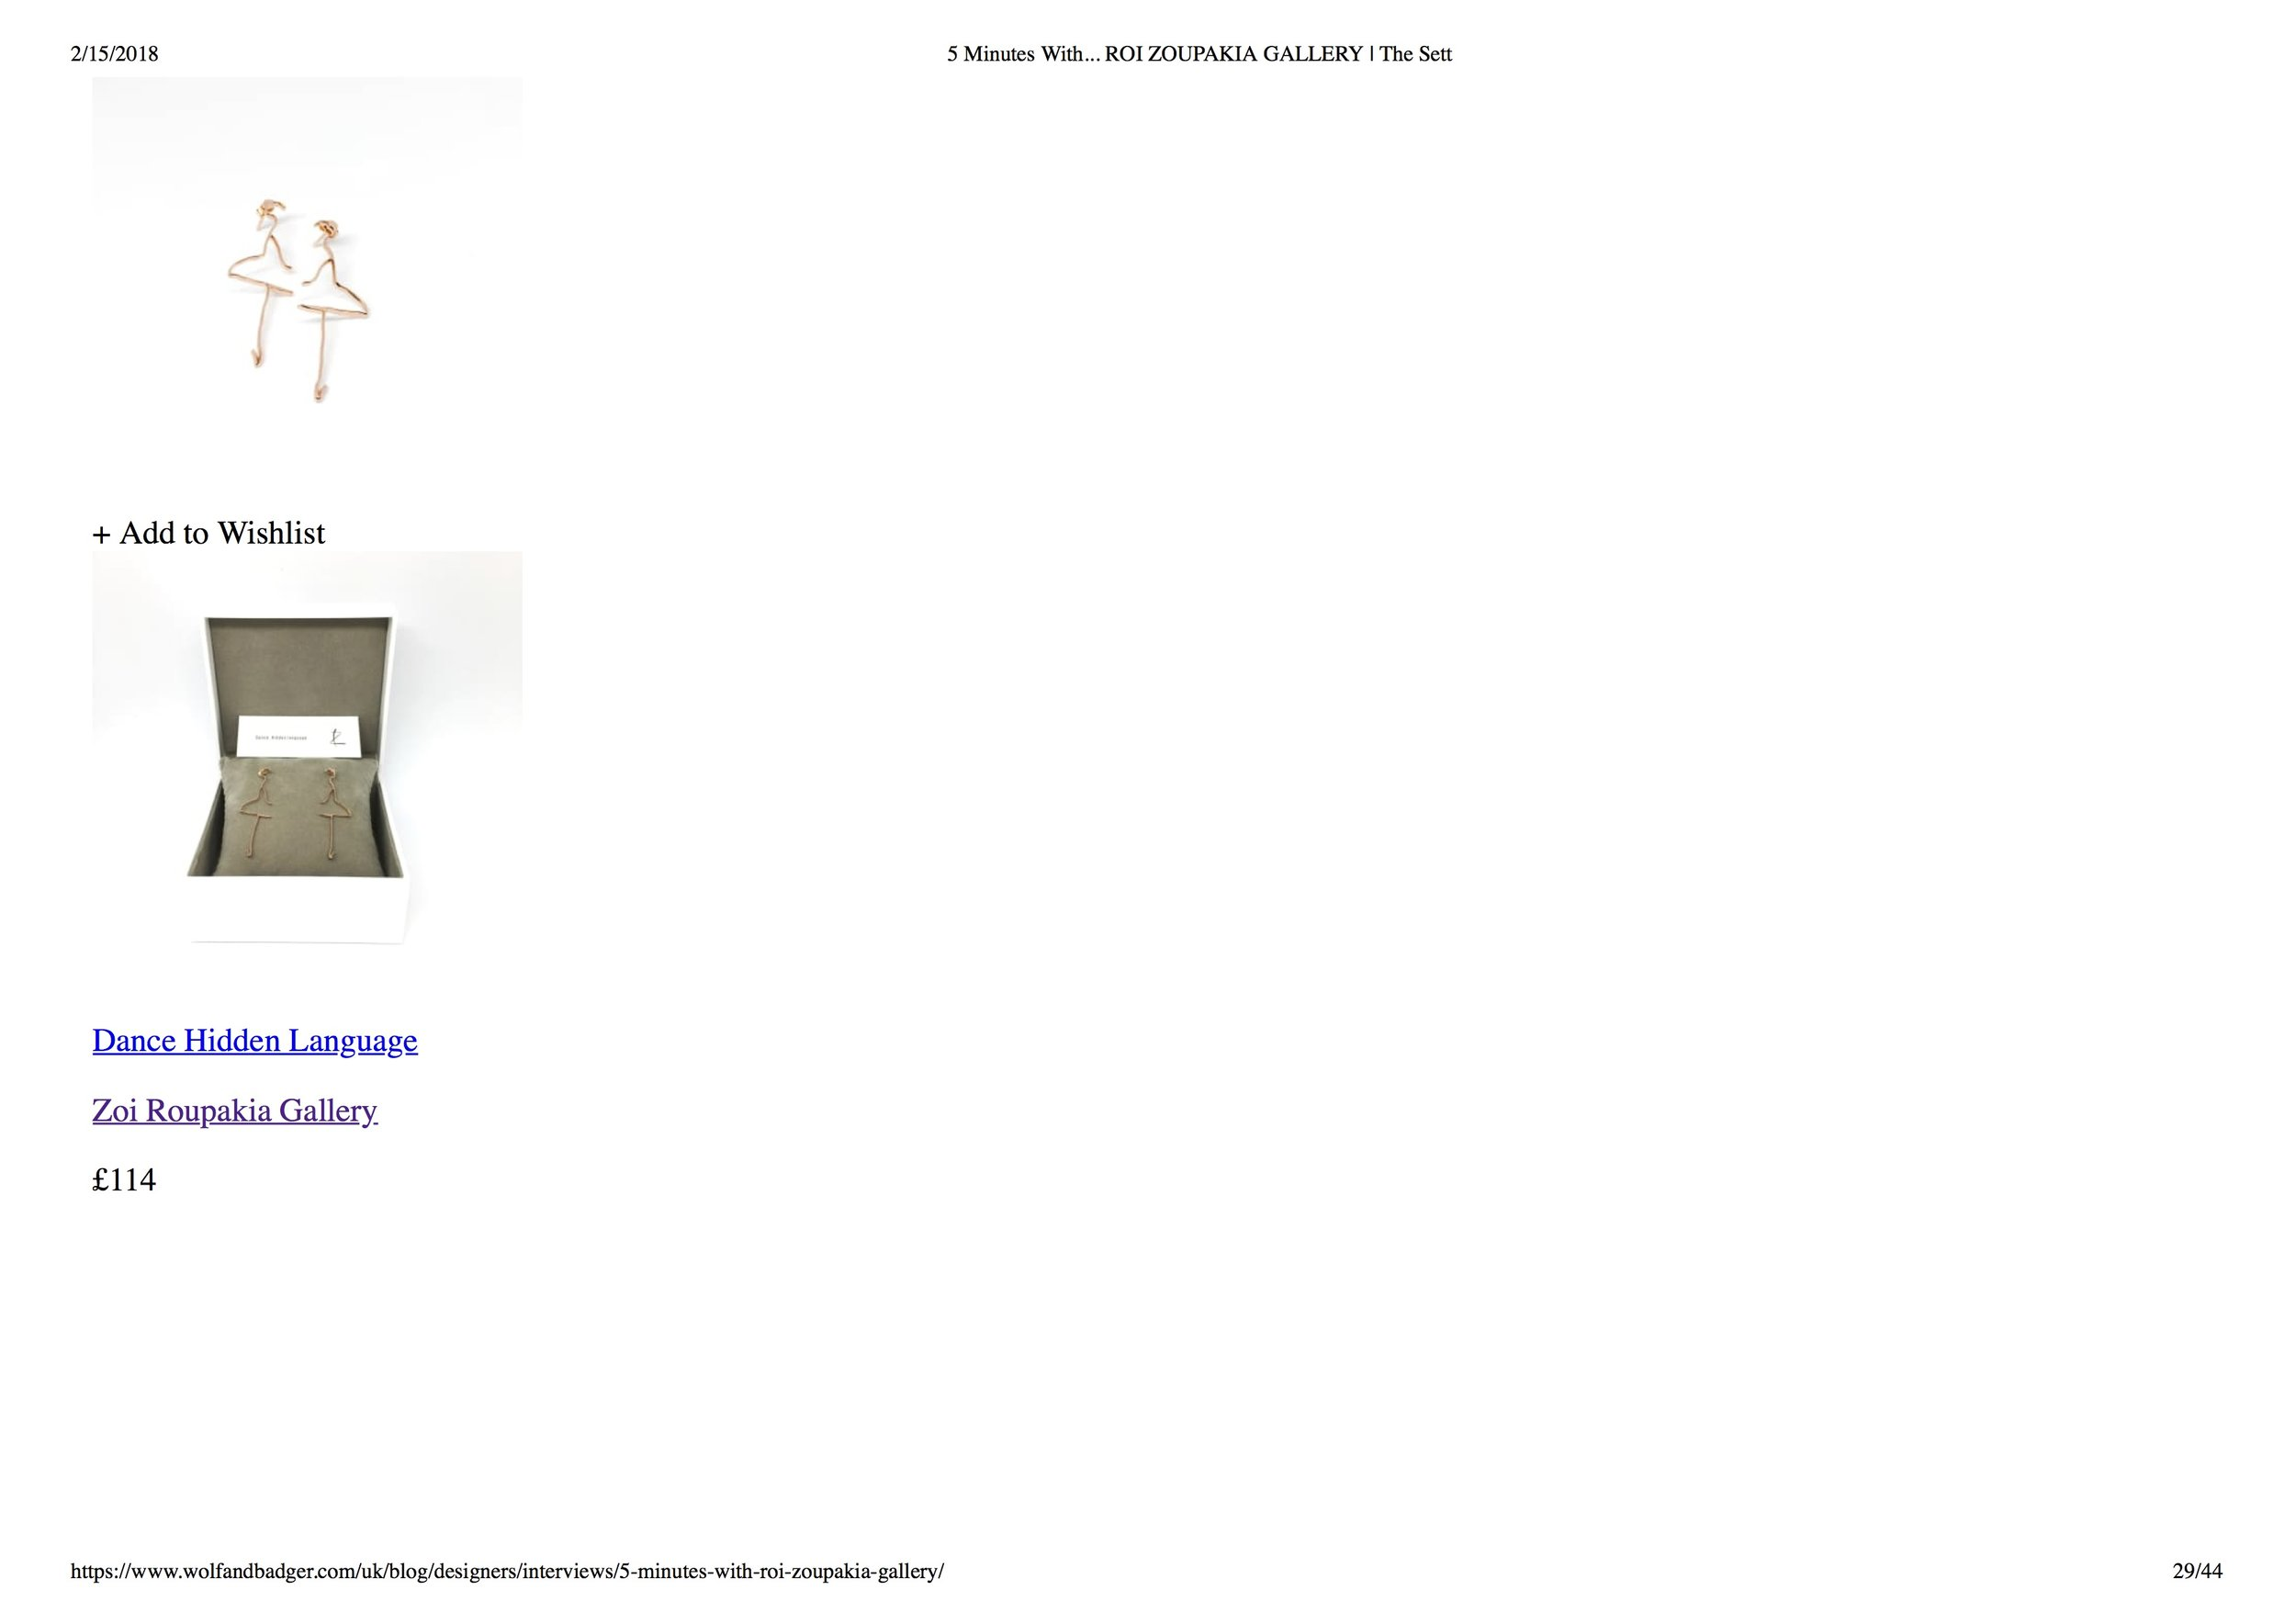 8.5 Minutes With... ROI ZOUPAKIA GALLERY | The Sett.jpg